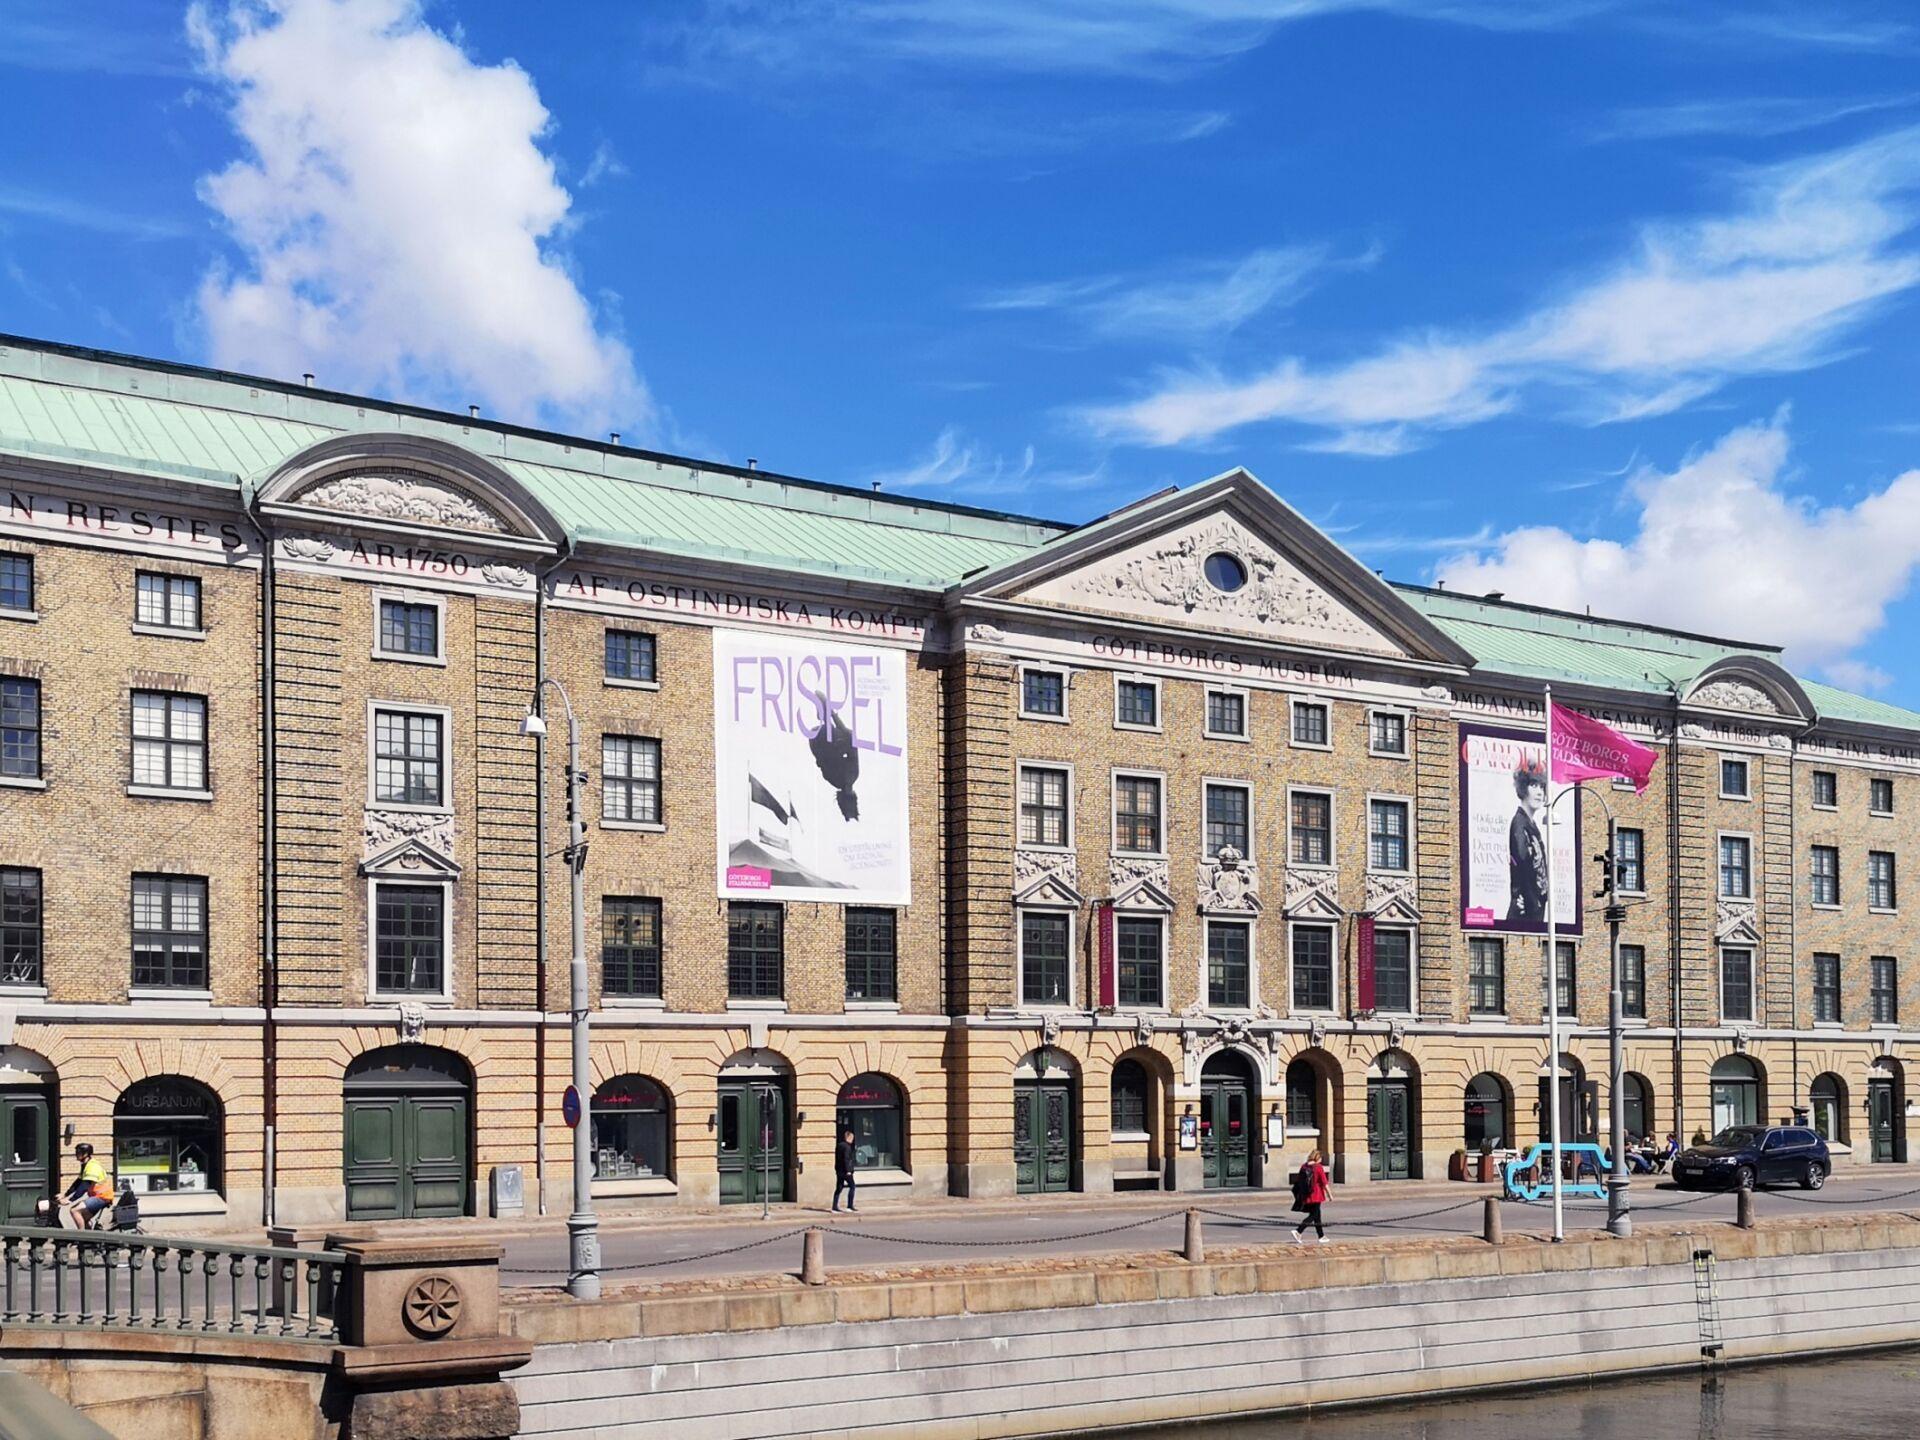 https://goteborgsstadsmuseum.se/uploads/brix/556/webbstadsmus3_0-qrndd6-1920x0.jpg